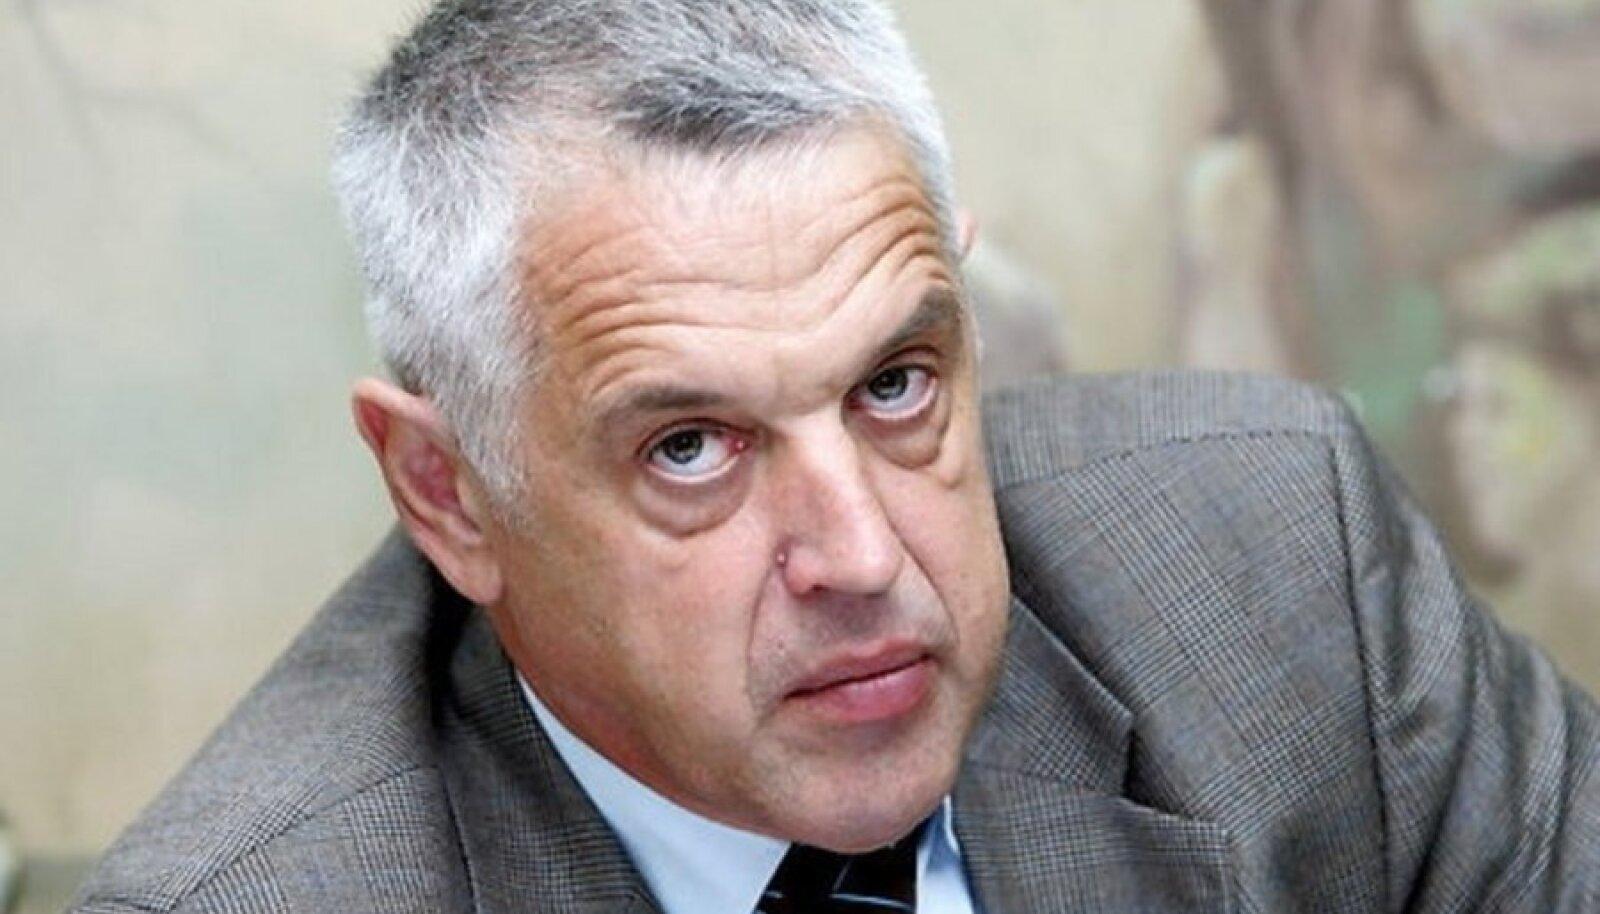 Aleksandr Gaponenko